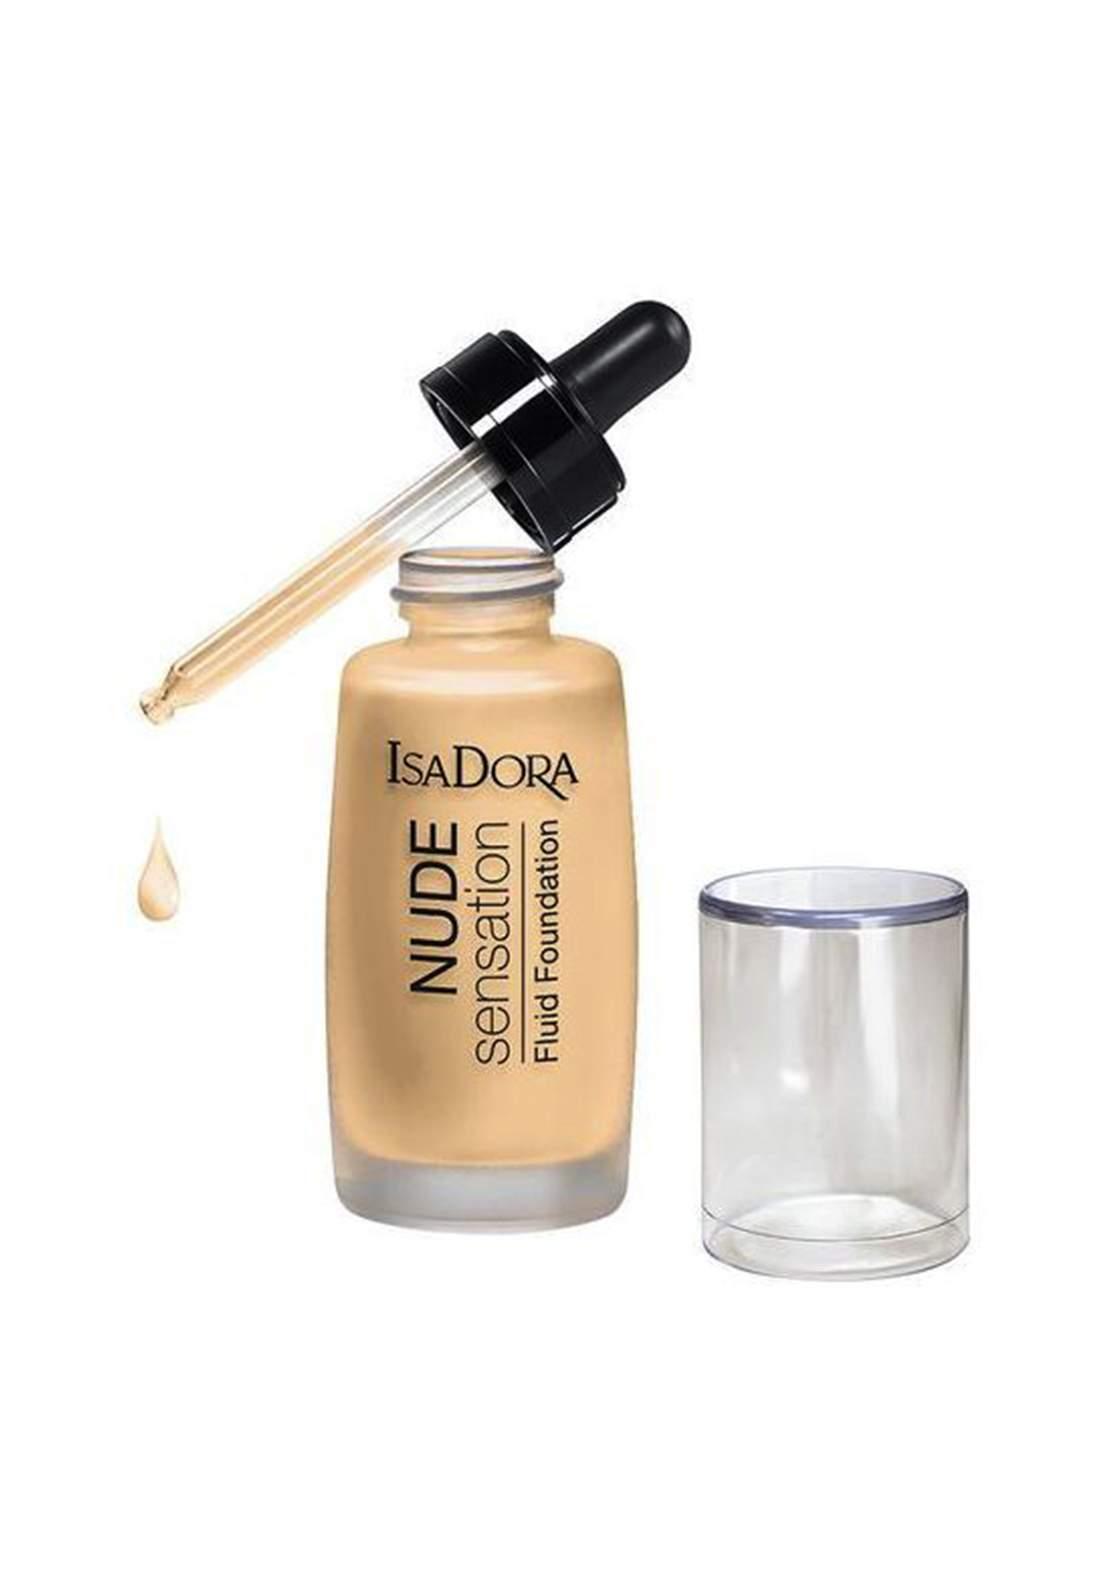 IsaDora 314292 Nude Super Fluid Foundation - Nude Blonde 30 ML كريم اساس